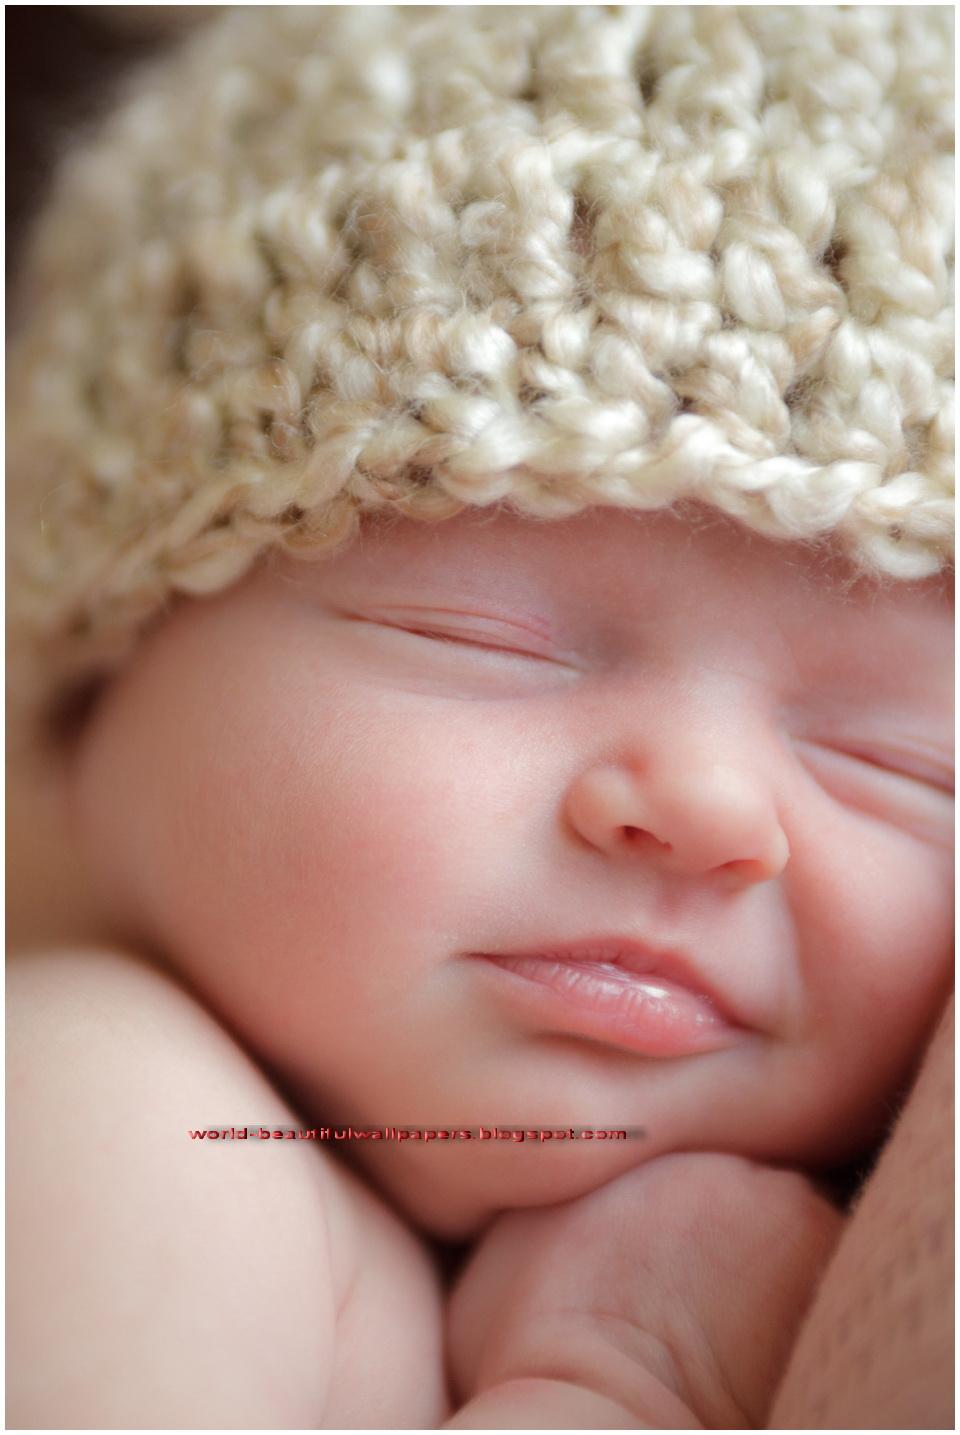 50 Newborn Baby Wallpaper On Wallpapersafari